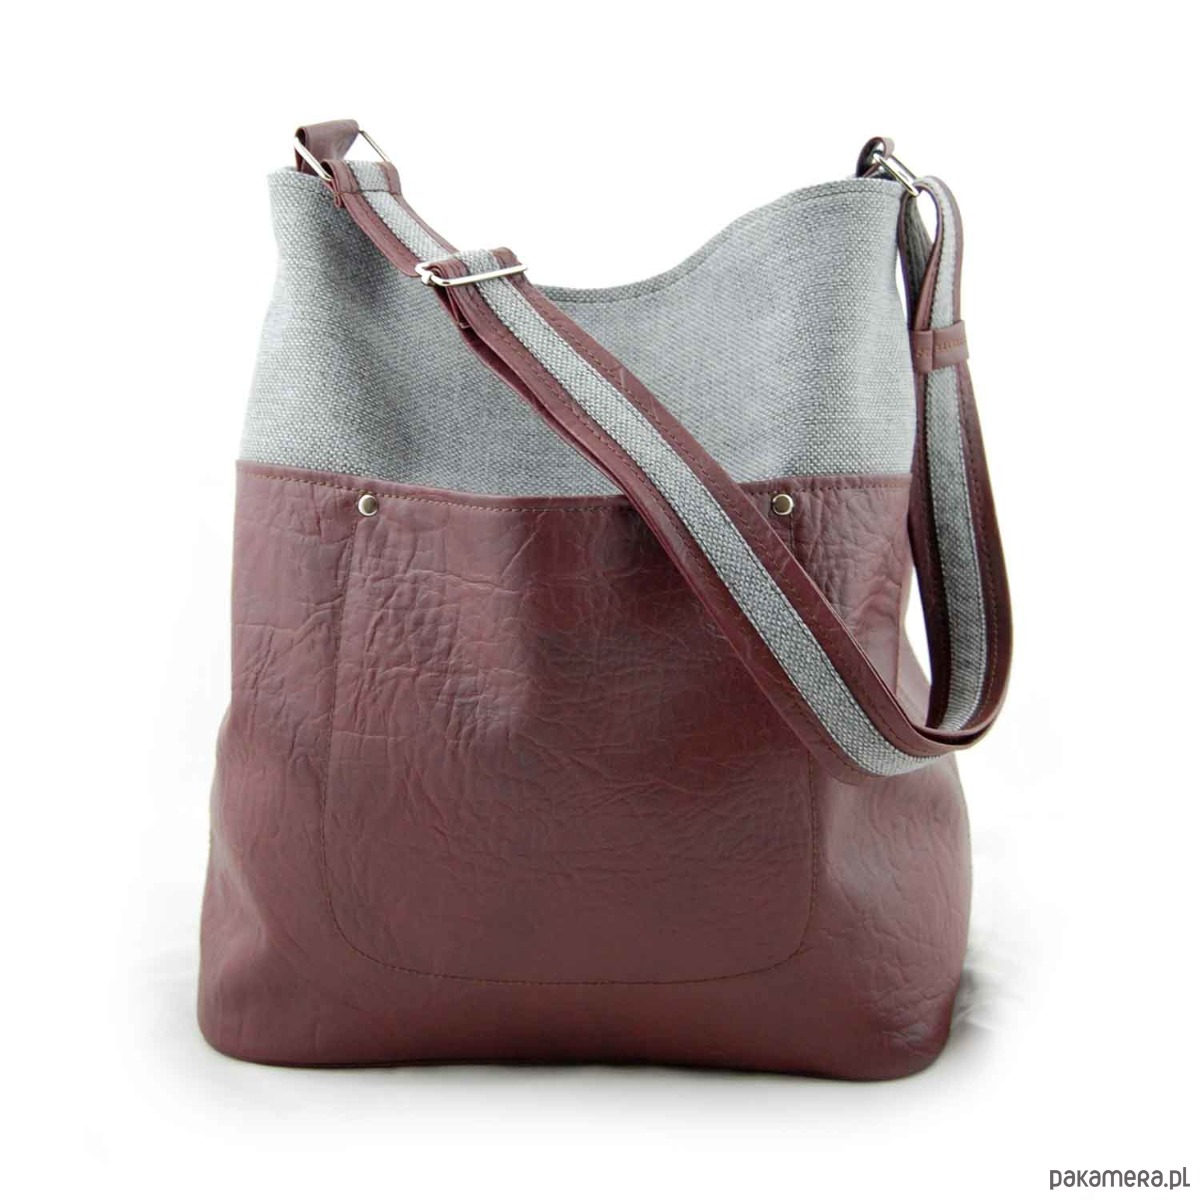 a405ad2192168 FRIDA - torba worek - burgund i szara plecionka - torby na ramię ...